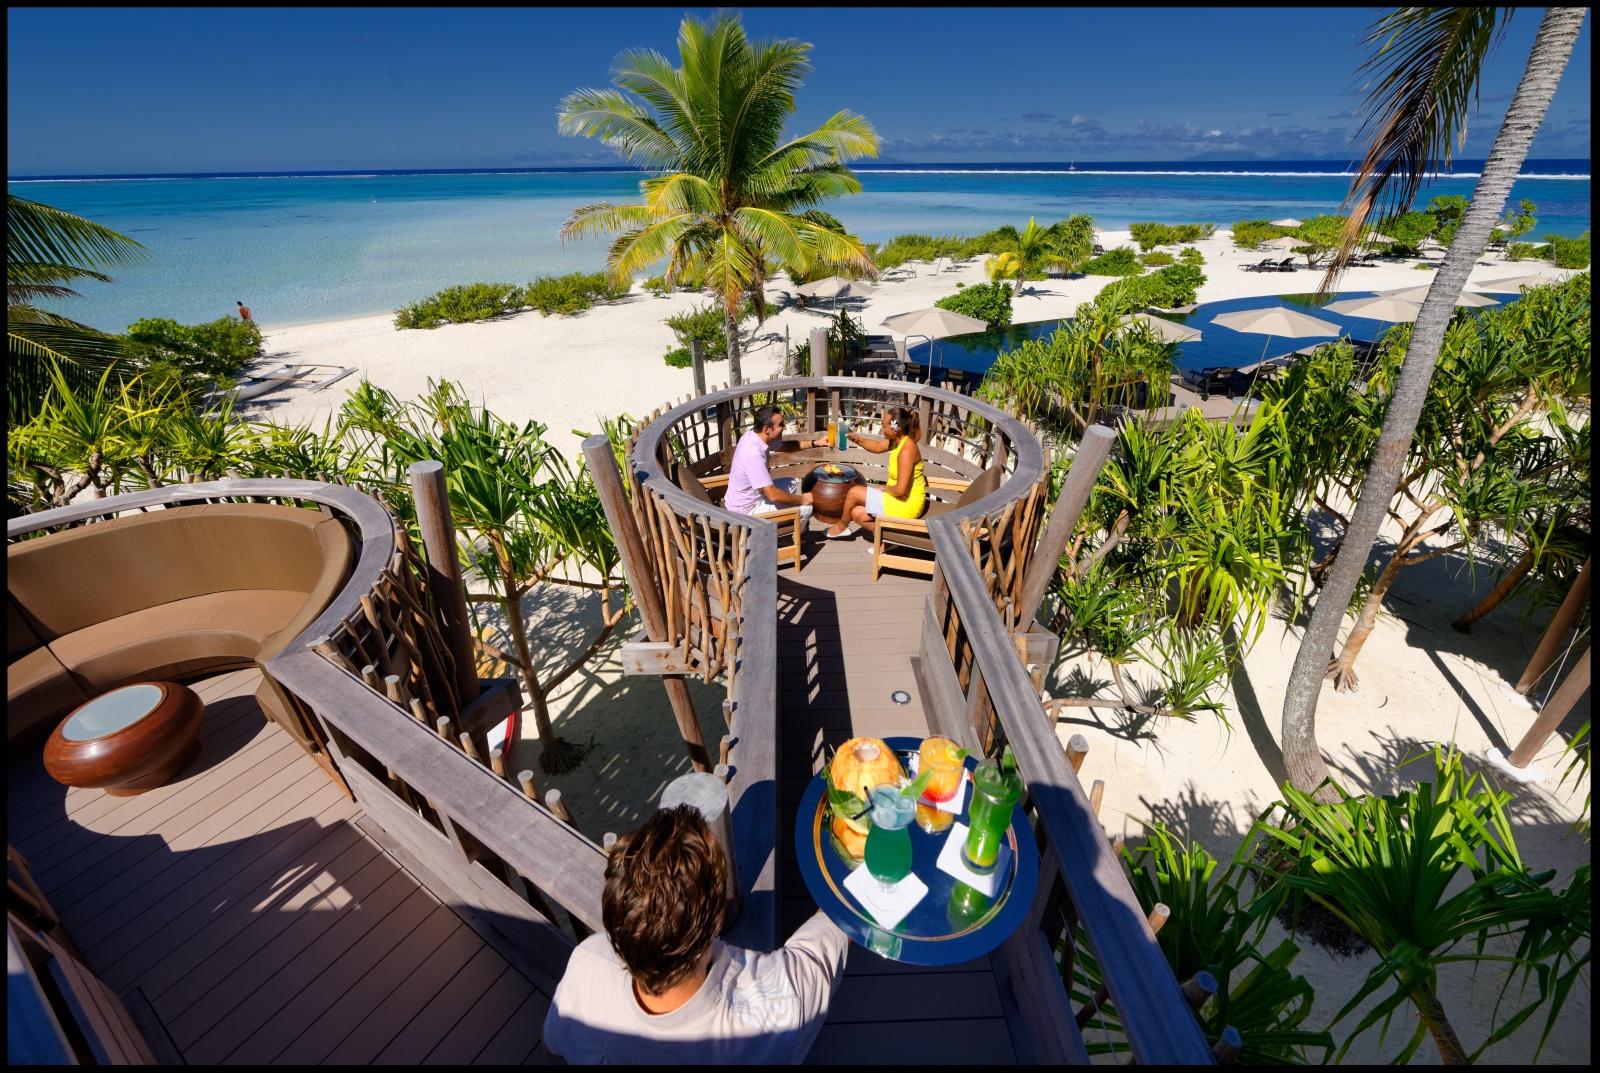 The Brando Hotel - French Polynesian Island Named After Marlon Brando